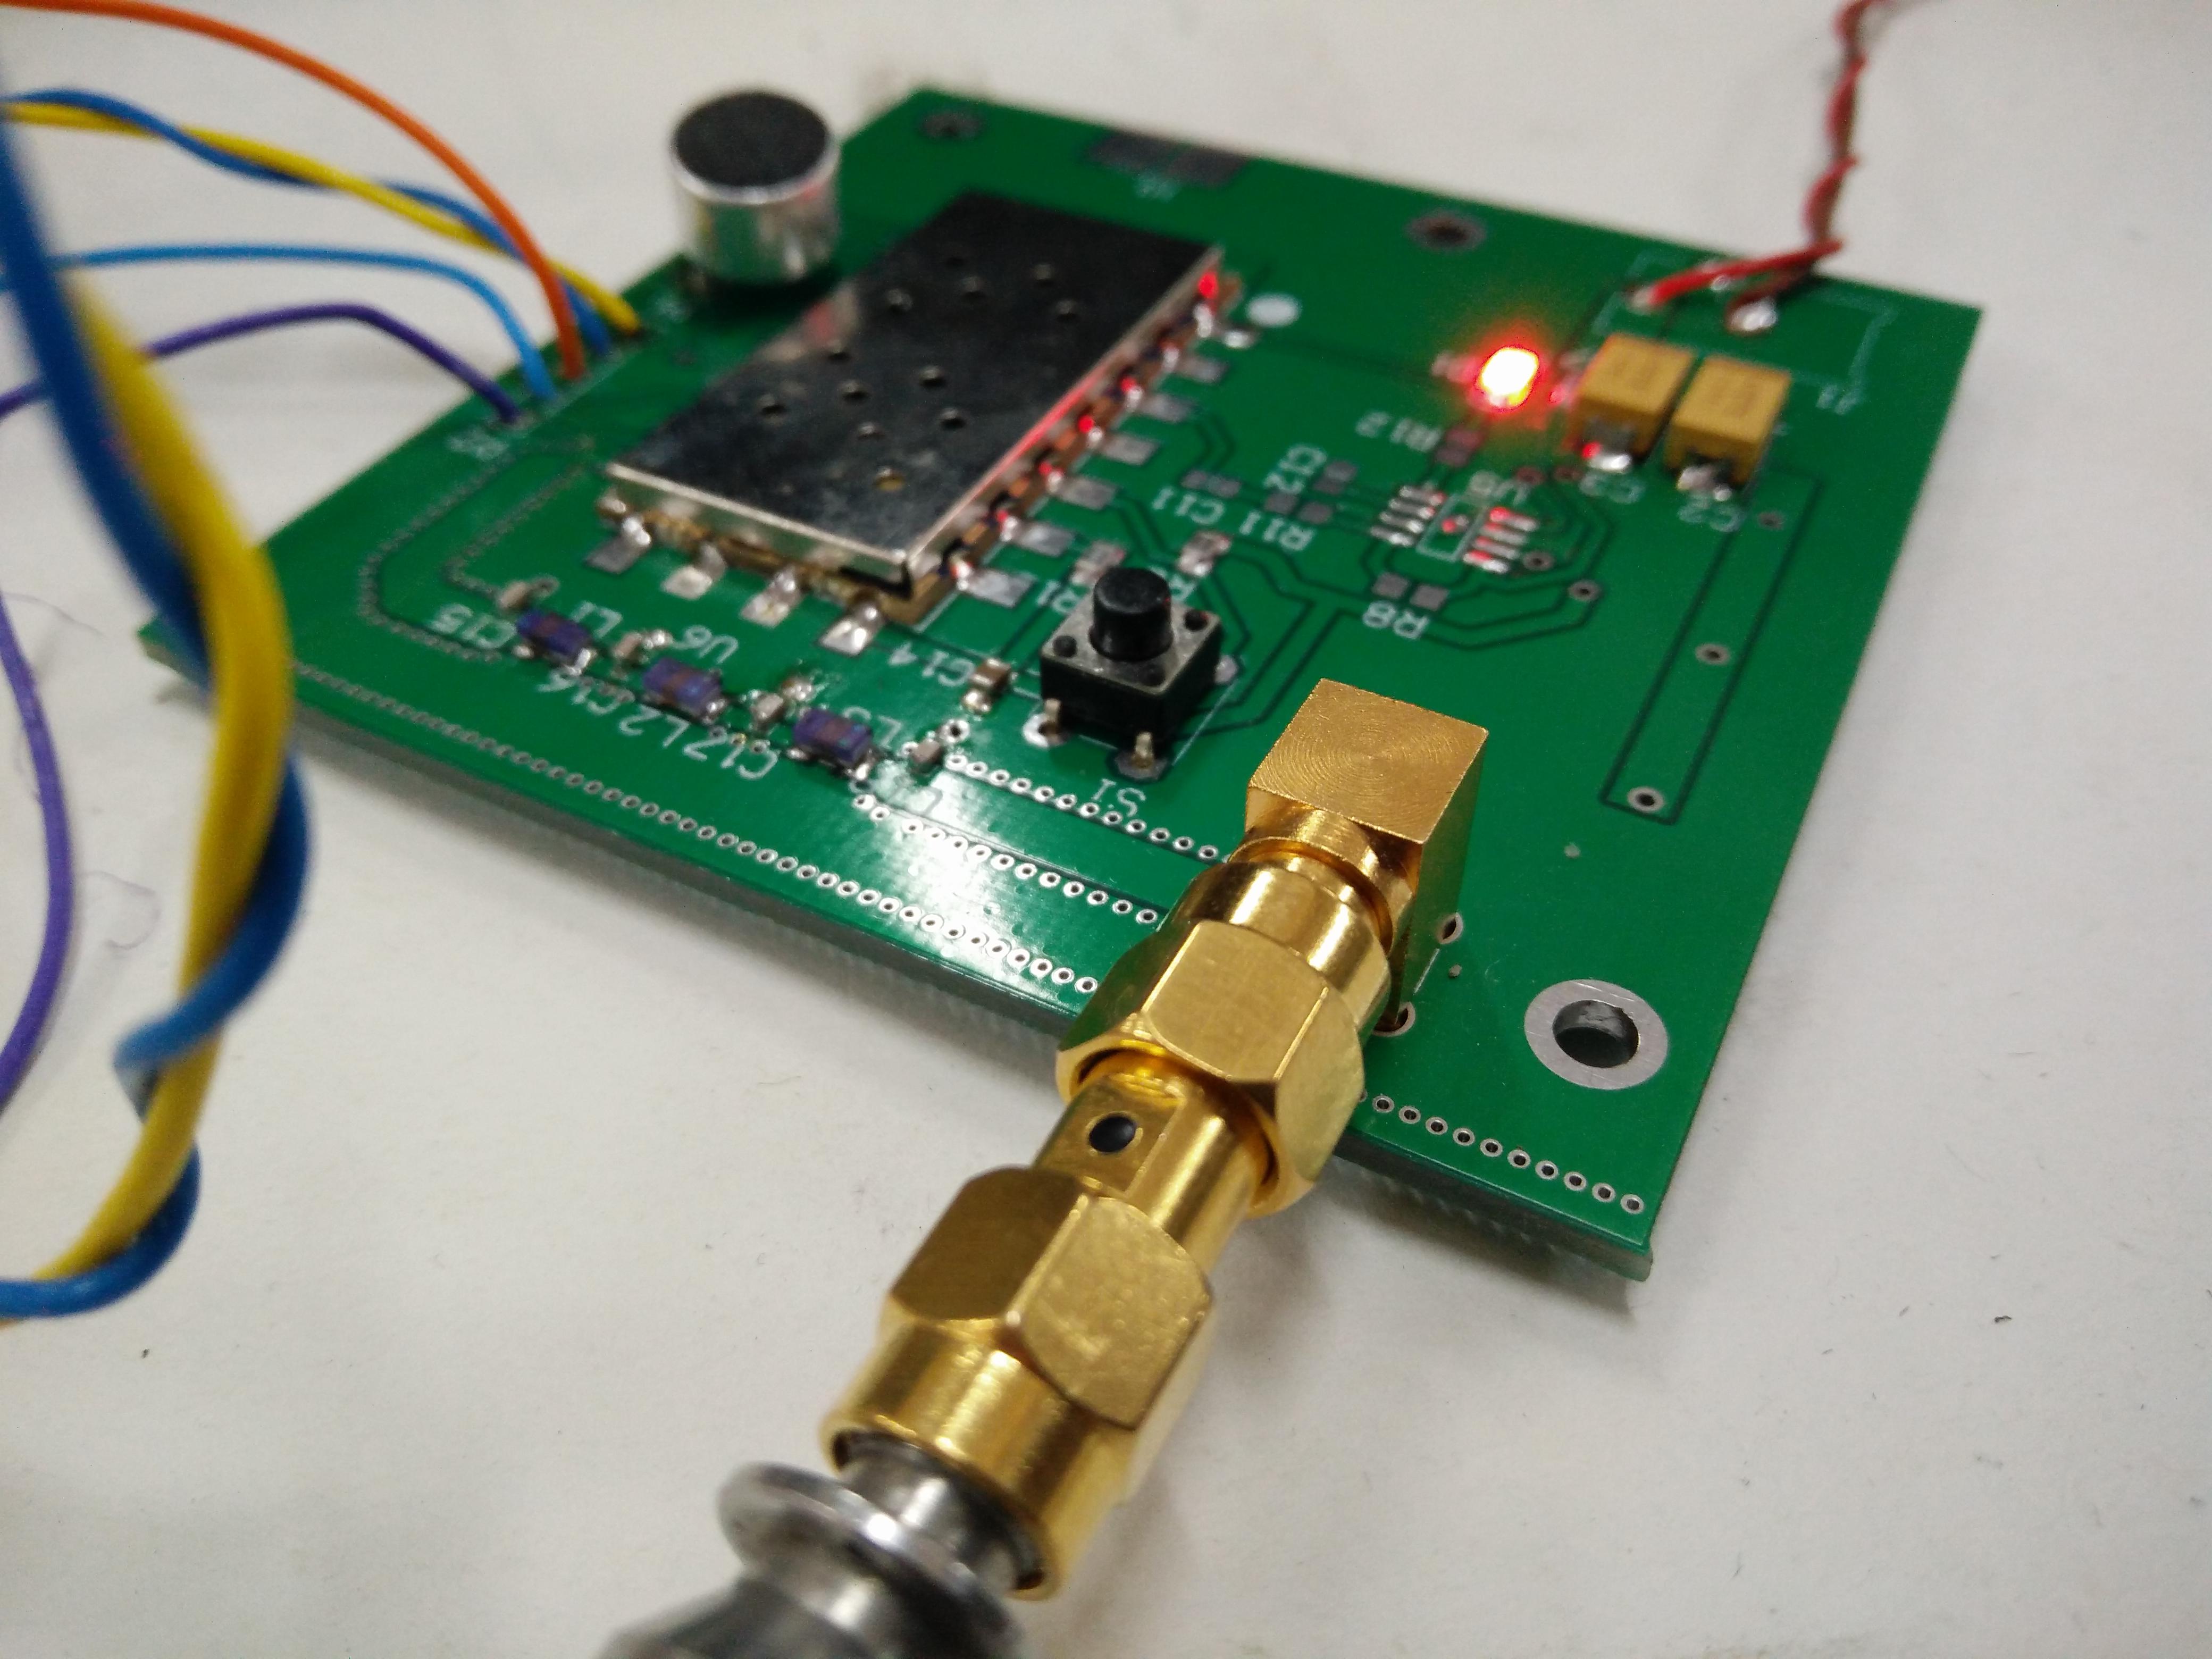 Dra818v Vhf Band Transceiver Part 1 How To Build Opamp Fm Transmitter